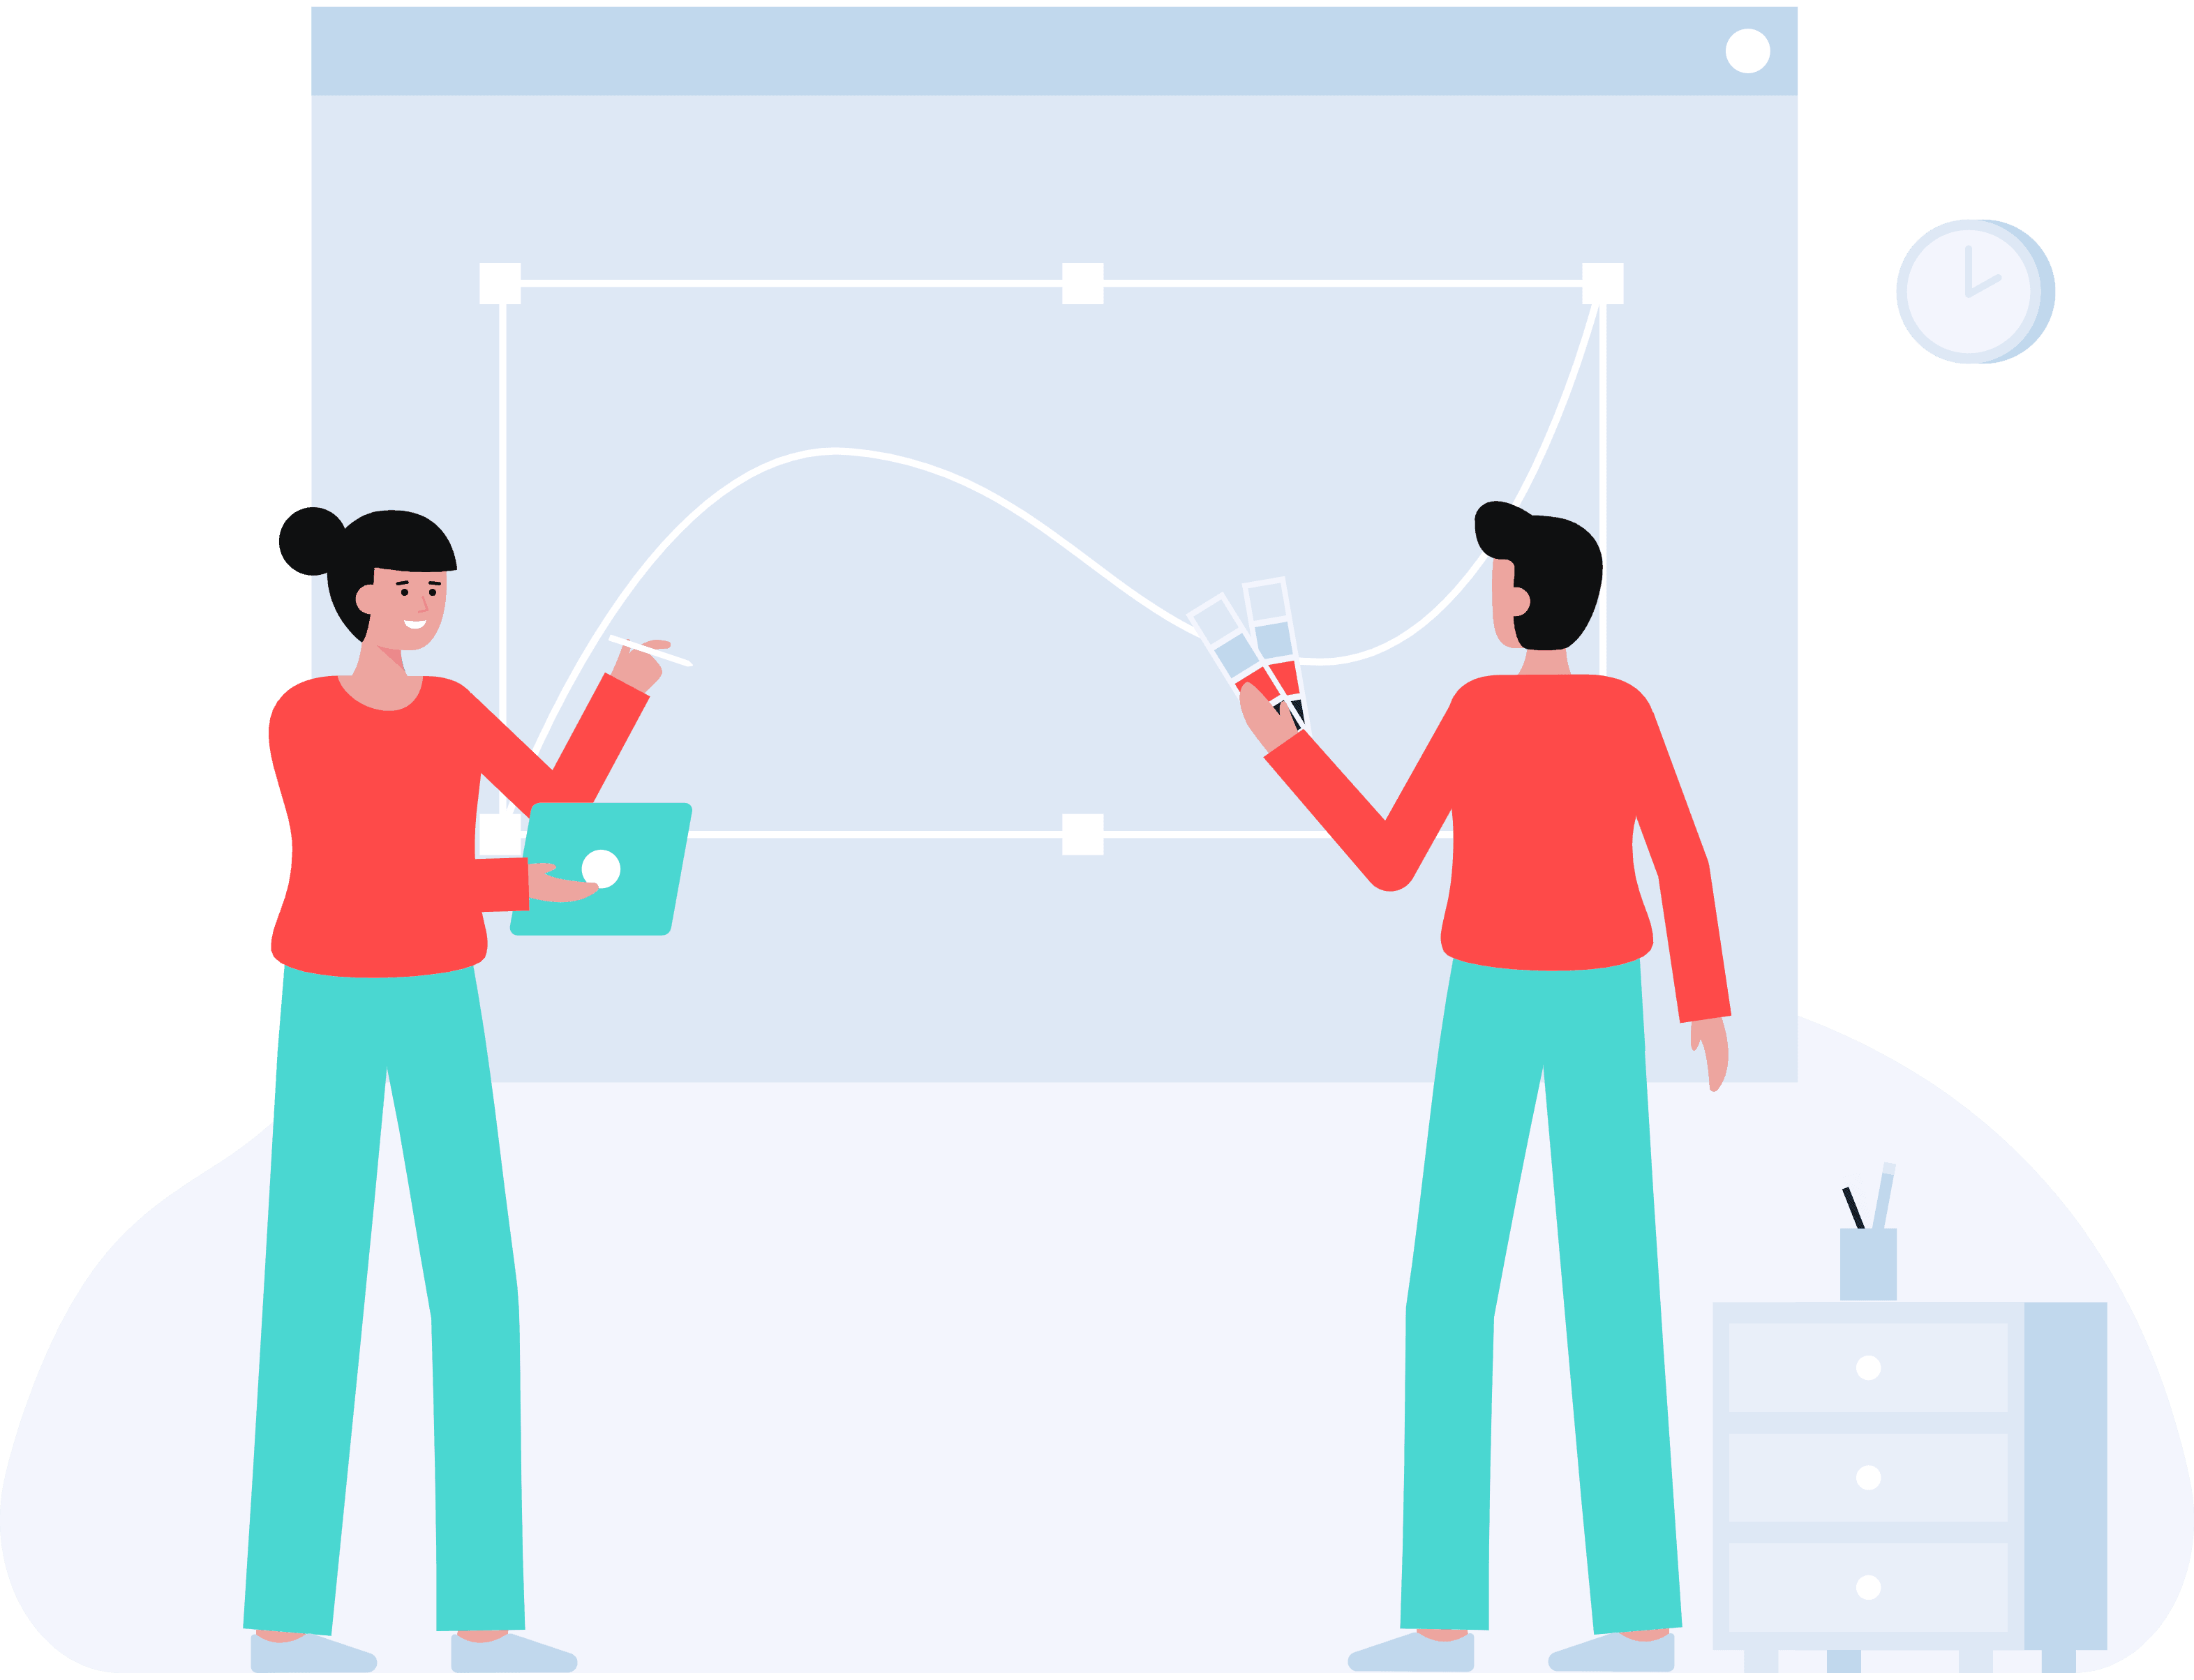 Design collaboration